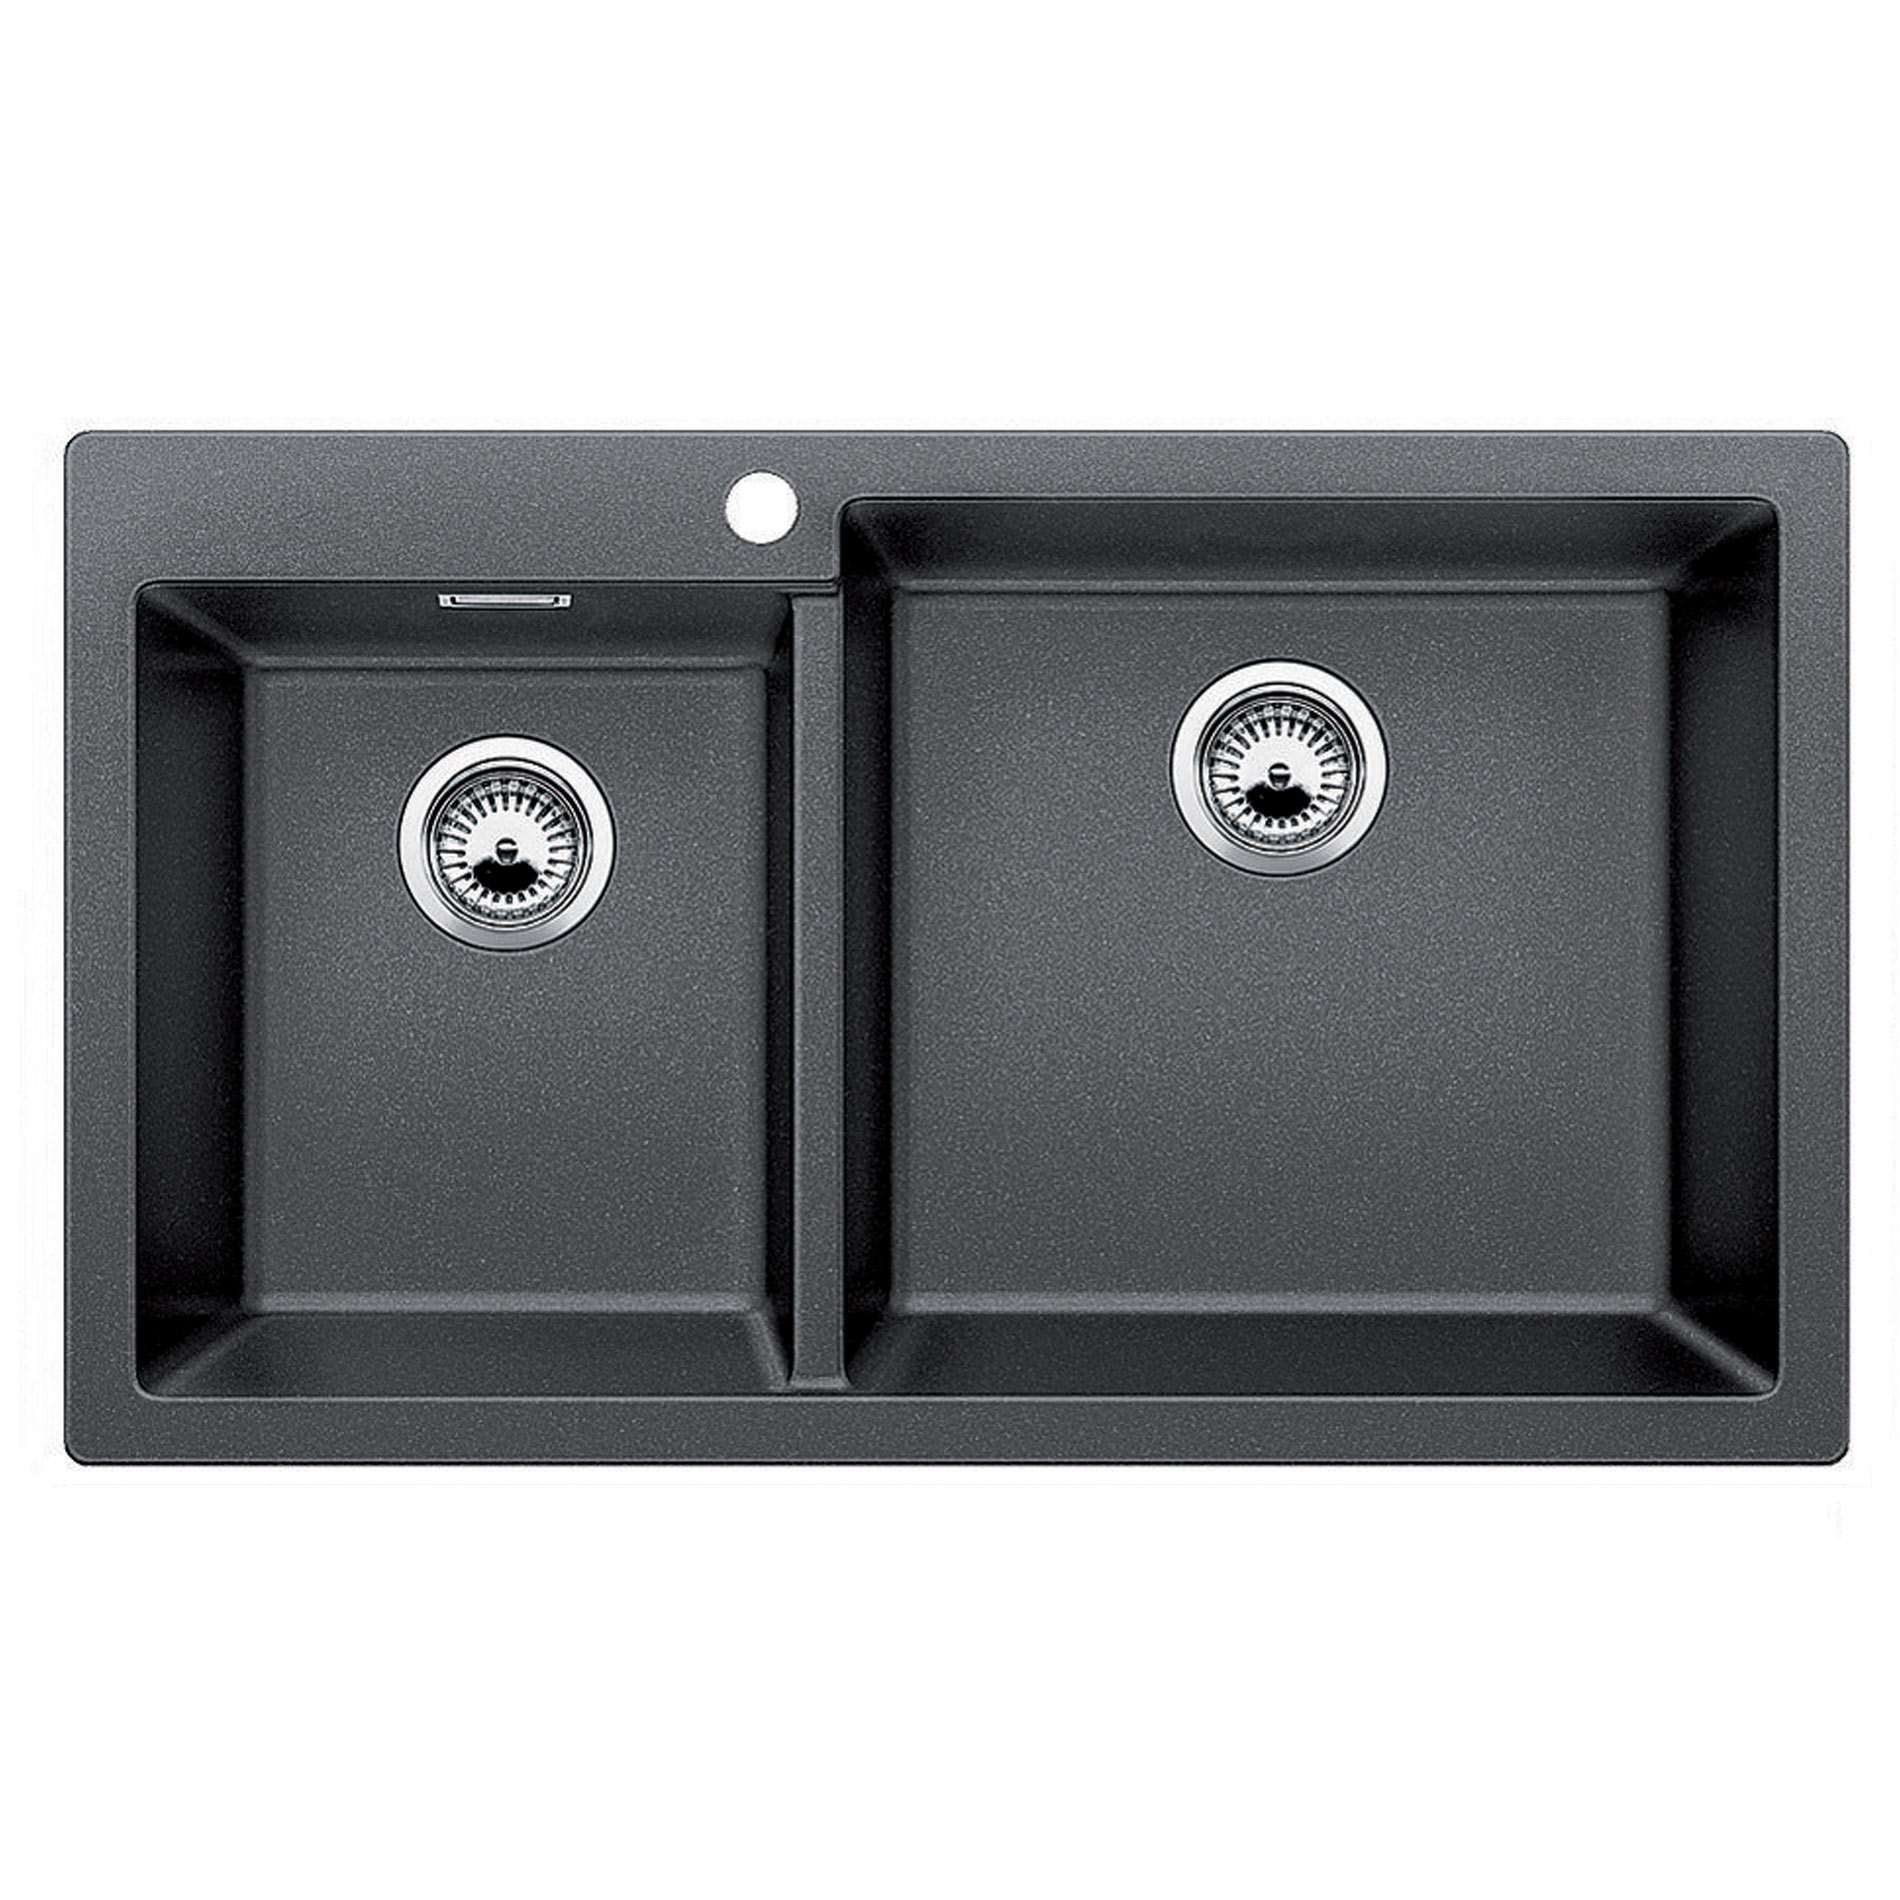 blanco pleon 9 anthracite silgranit sink kitchen sinks. Black Bedroom Furniture Sets. Home Design Ideas